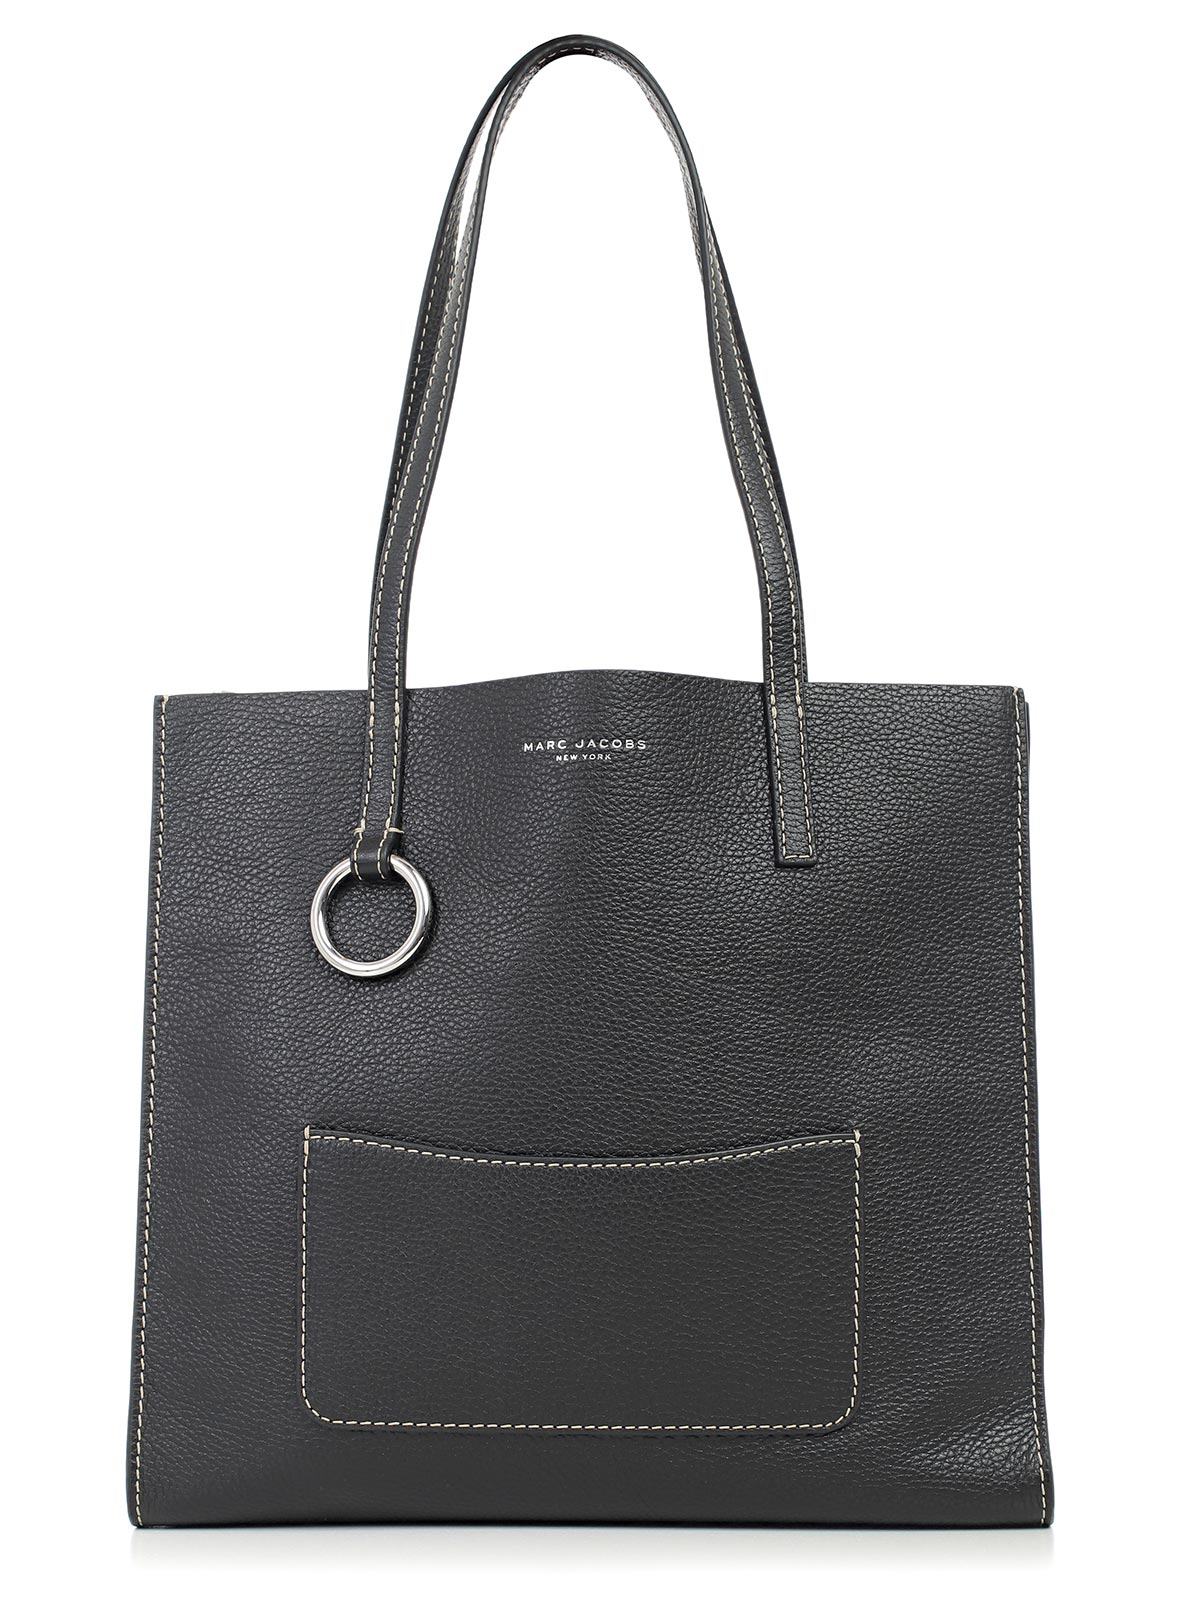 Picture of Marc Jacobs Shoulder Bag